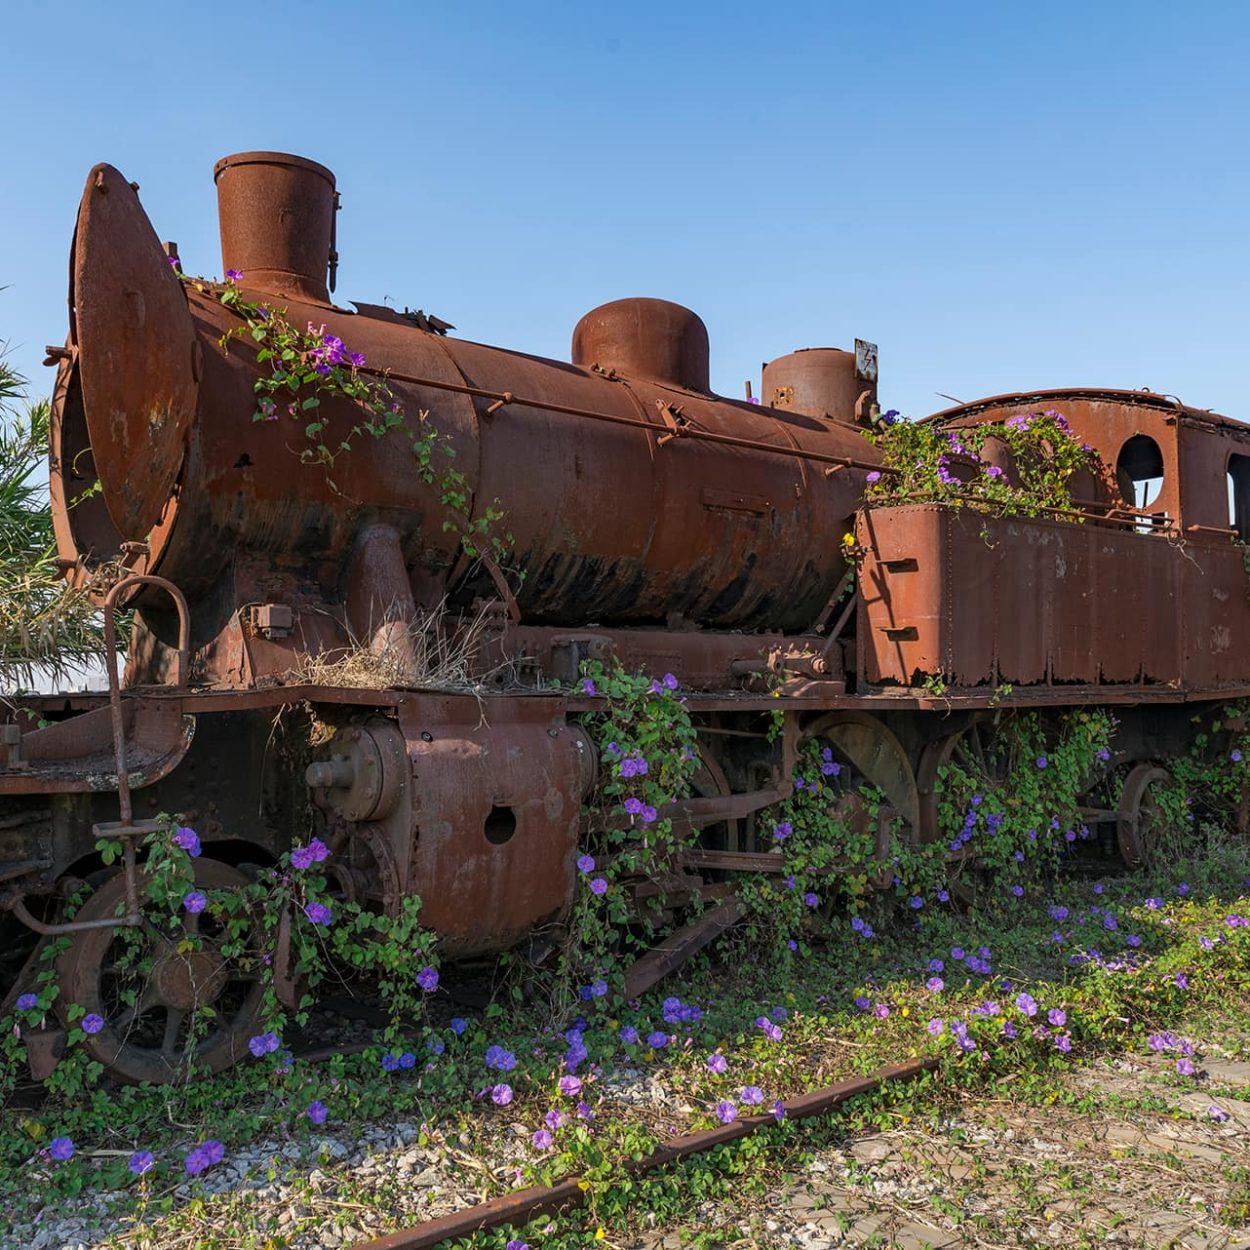 urbex-urban-exploration-portugal-train-graveyard-locomotive